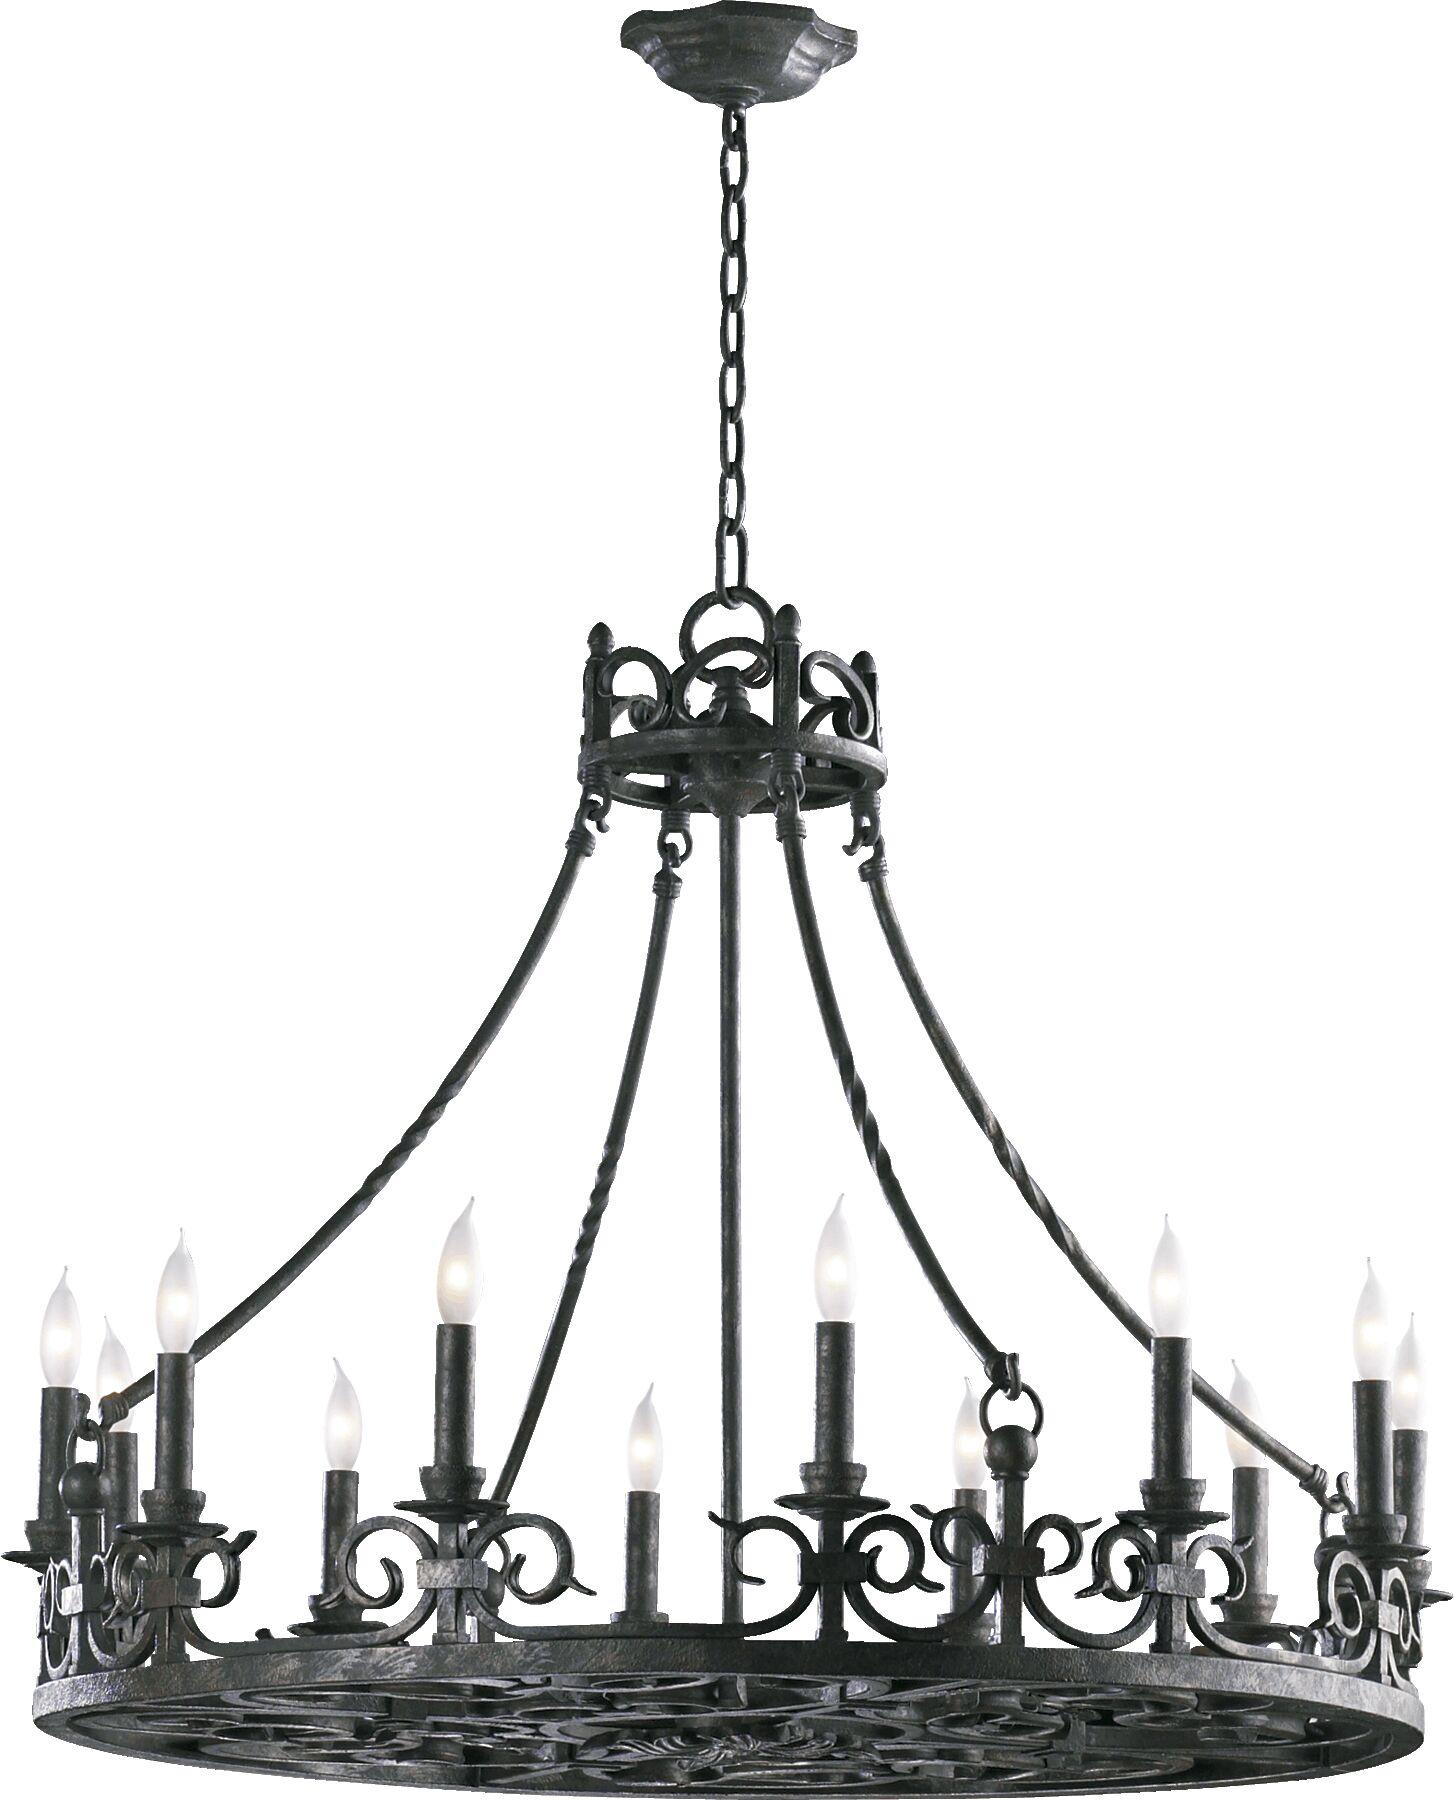 Lorenco 12-Light Wagon Wheel Chandelier